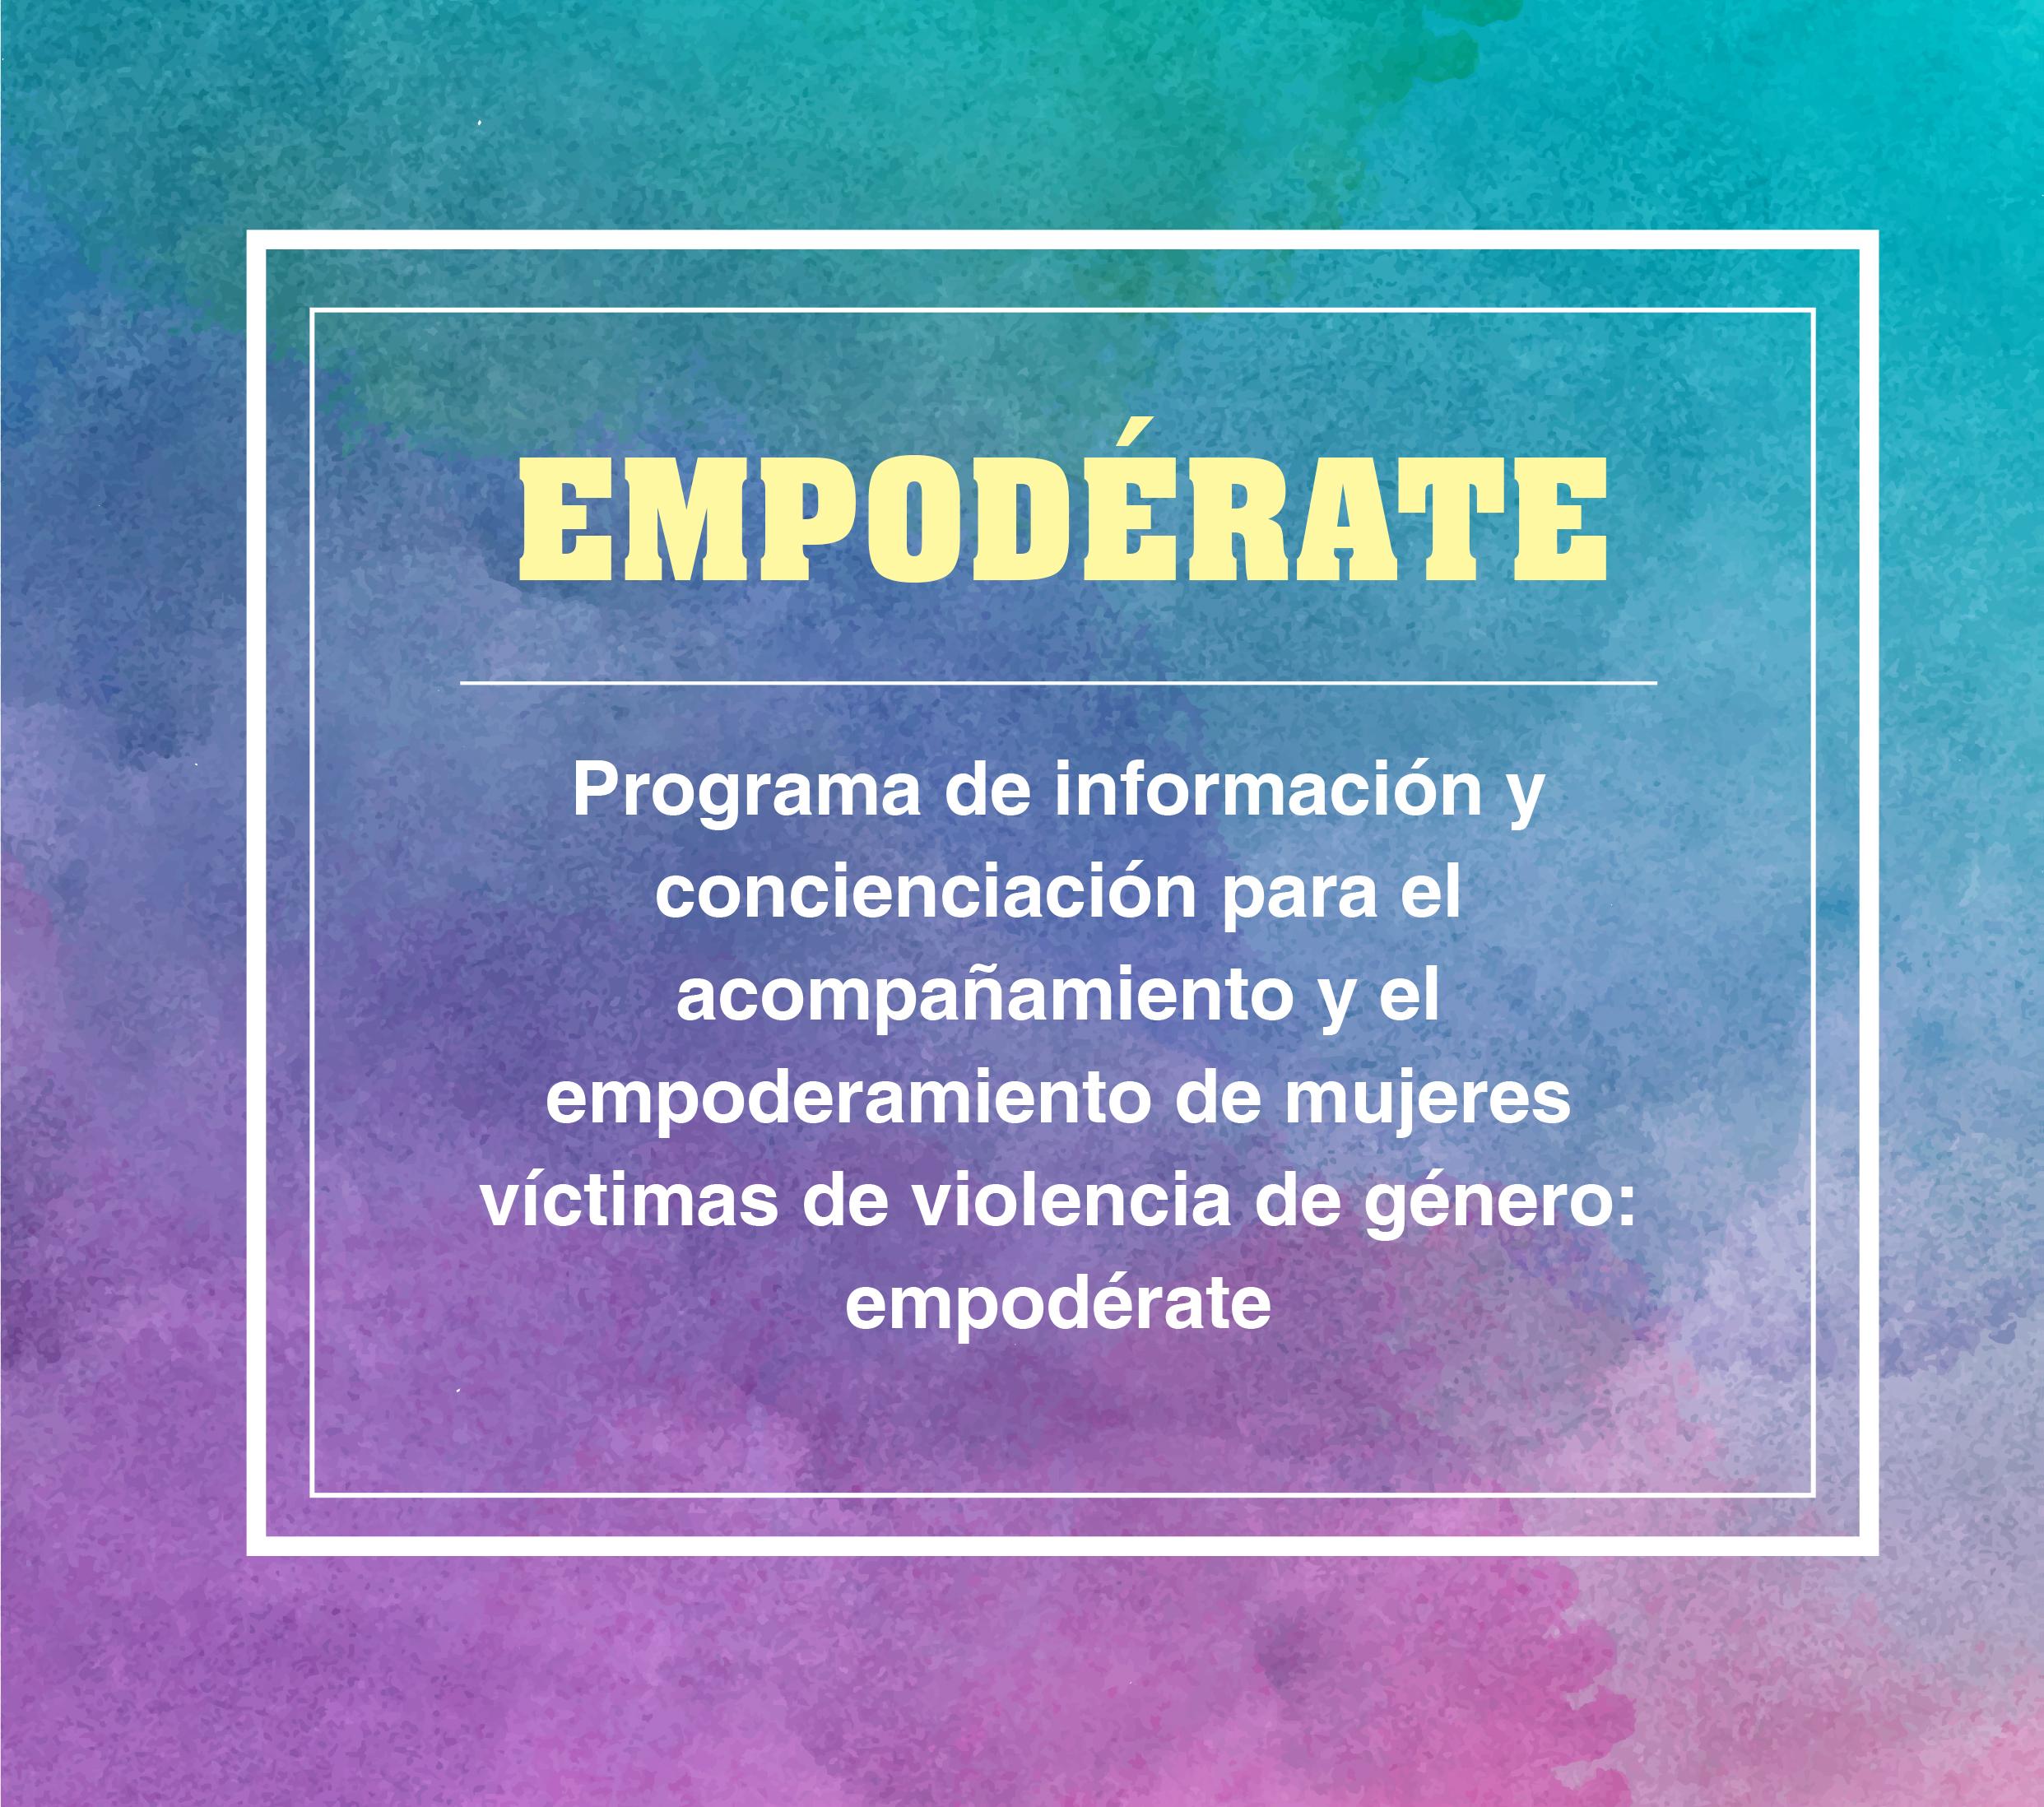 Course Image 3ª Edición: Formación específica de voluntariado. Proyecto Empodérate.